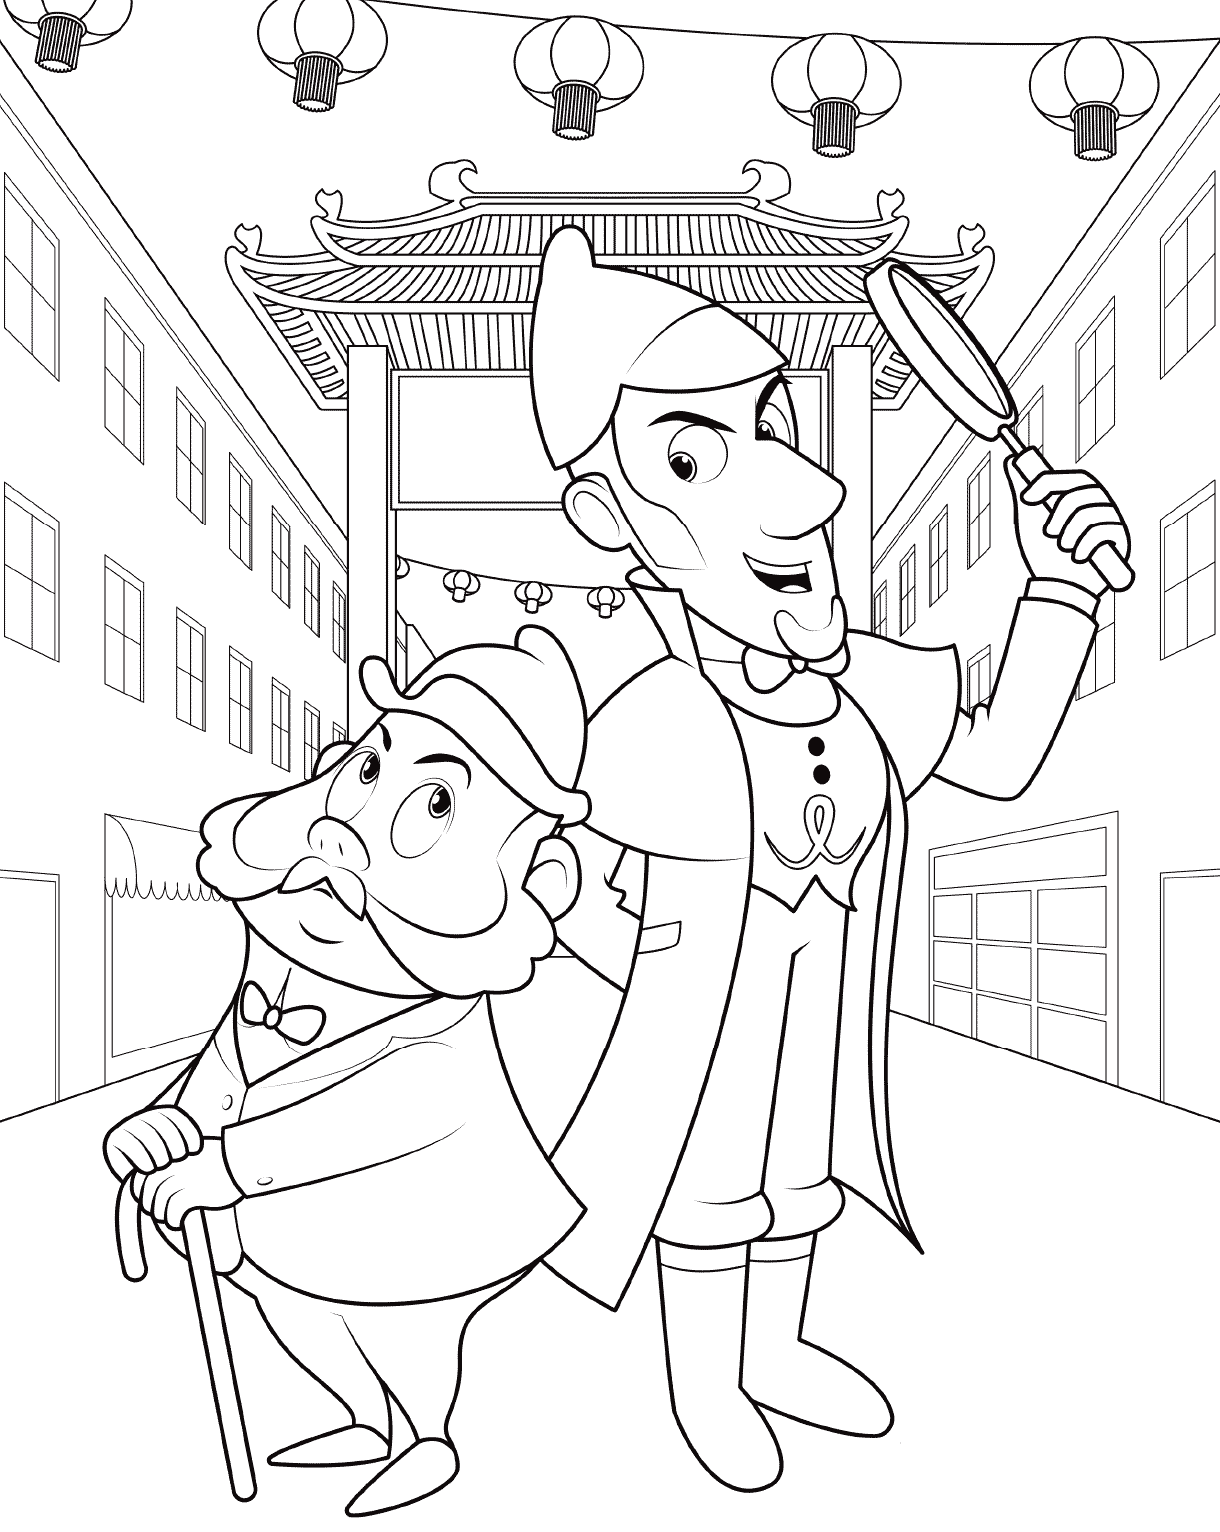 Sherlock Gnomes and Gnome Watson Coloring Page